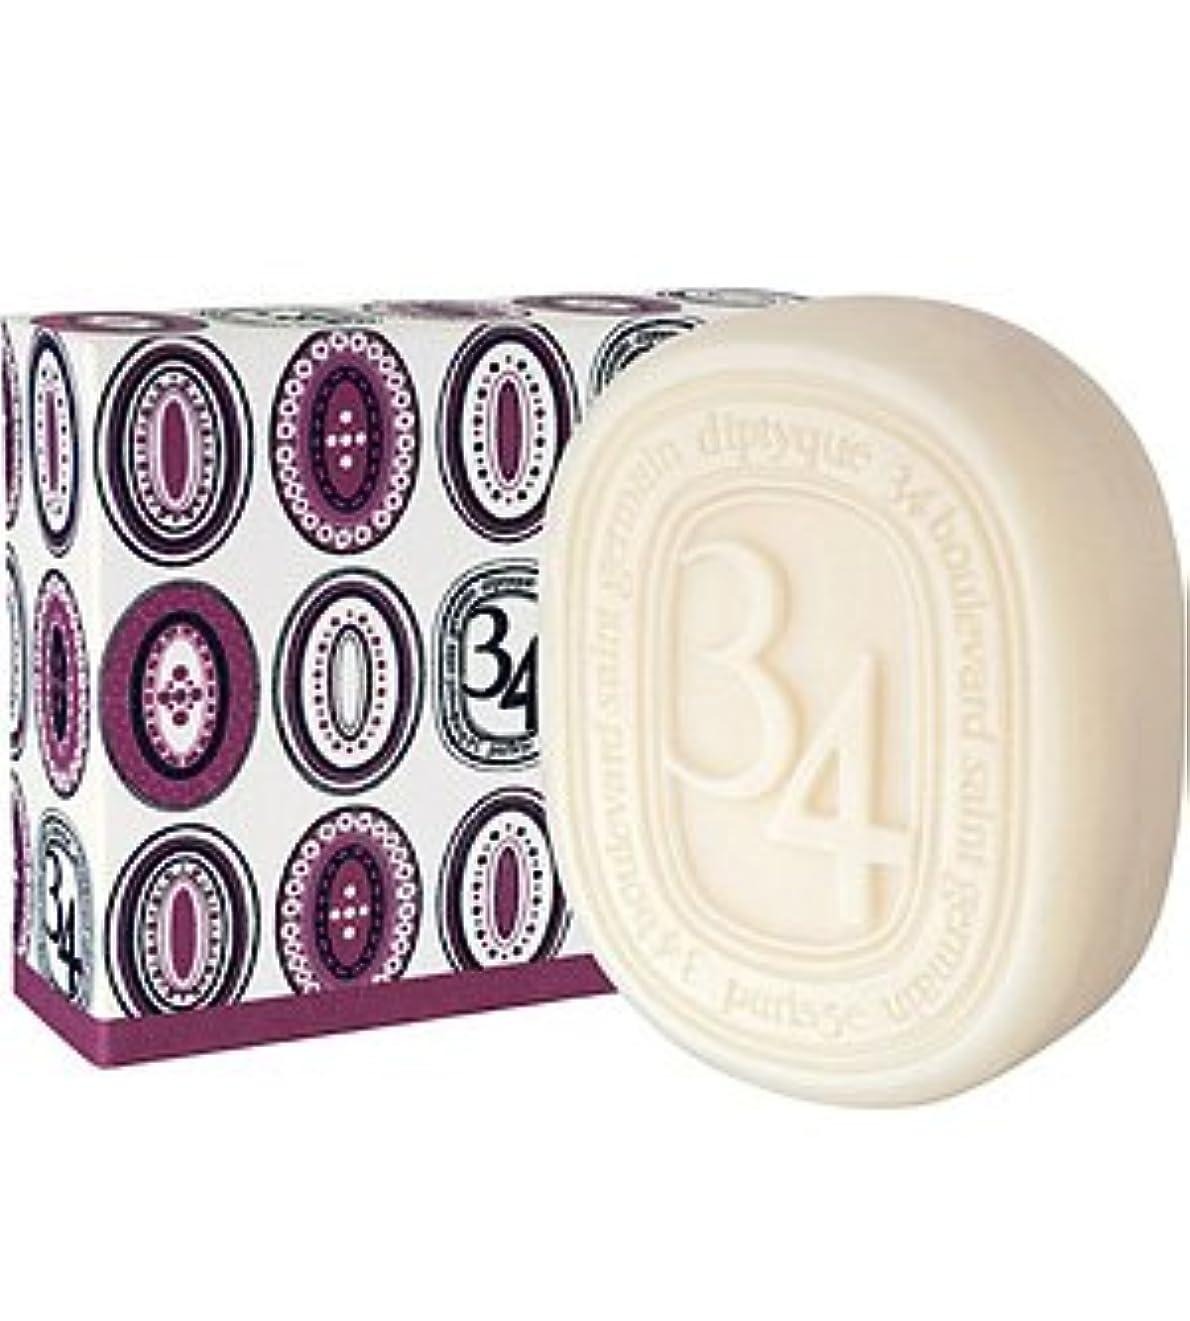 Diptyque - 34 Boulevard Saint Germain (ディプティック 34 ブールバード セイント ジャーマン) 200 g Soap (固形石鹸)